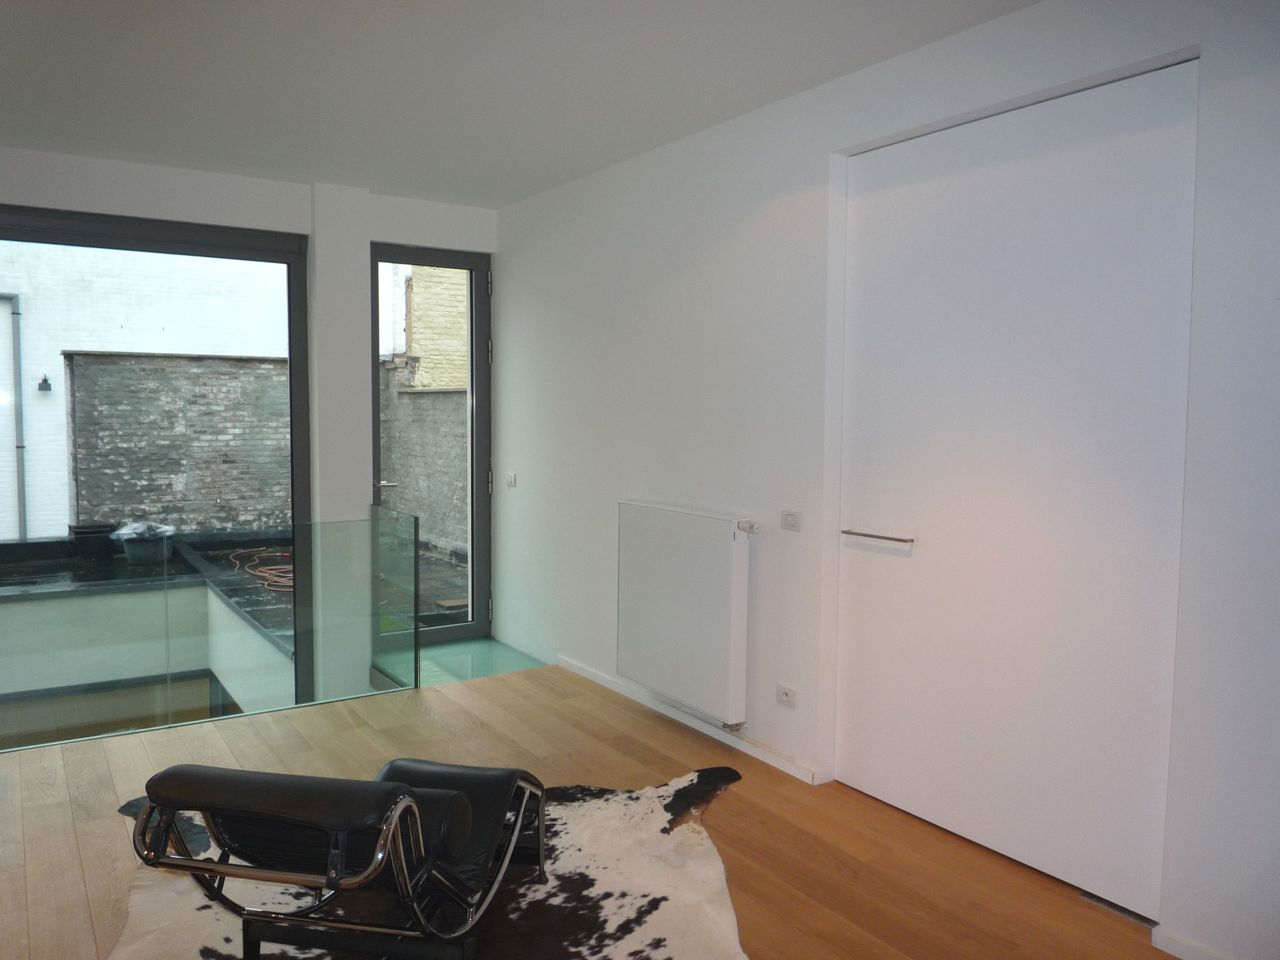 P1050576 | Baeyens & Beck architecten Gent | architect nieuwbouw renovatie interieur | high end | architectenbureau